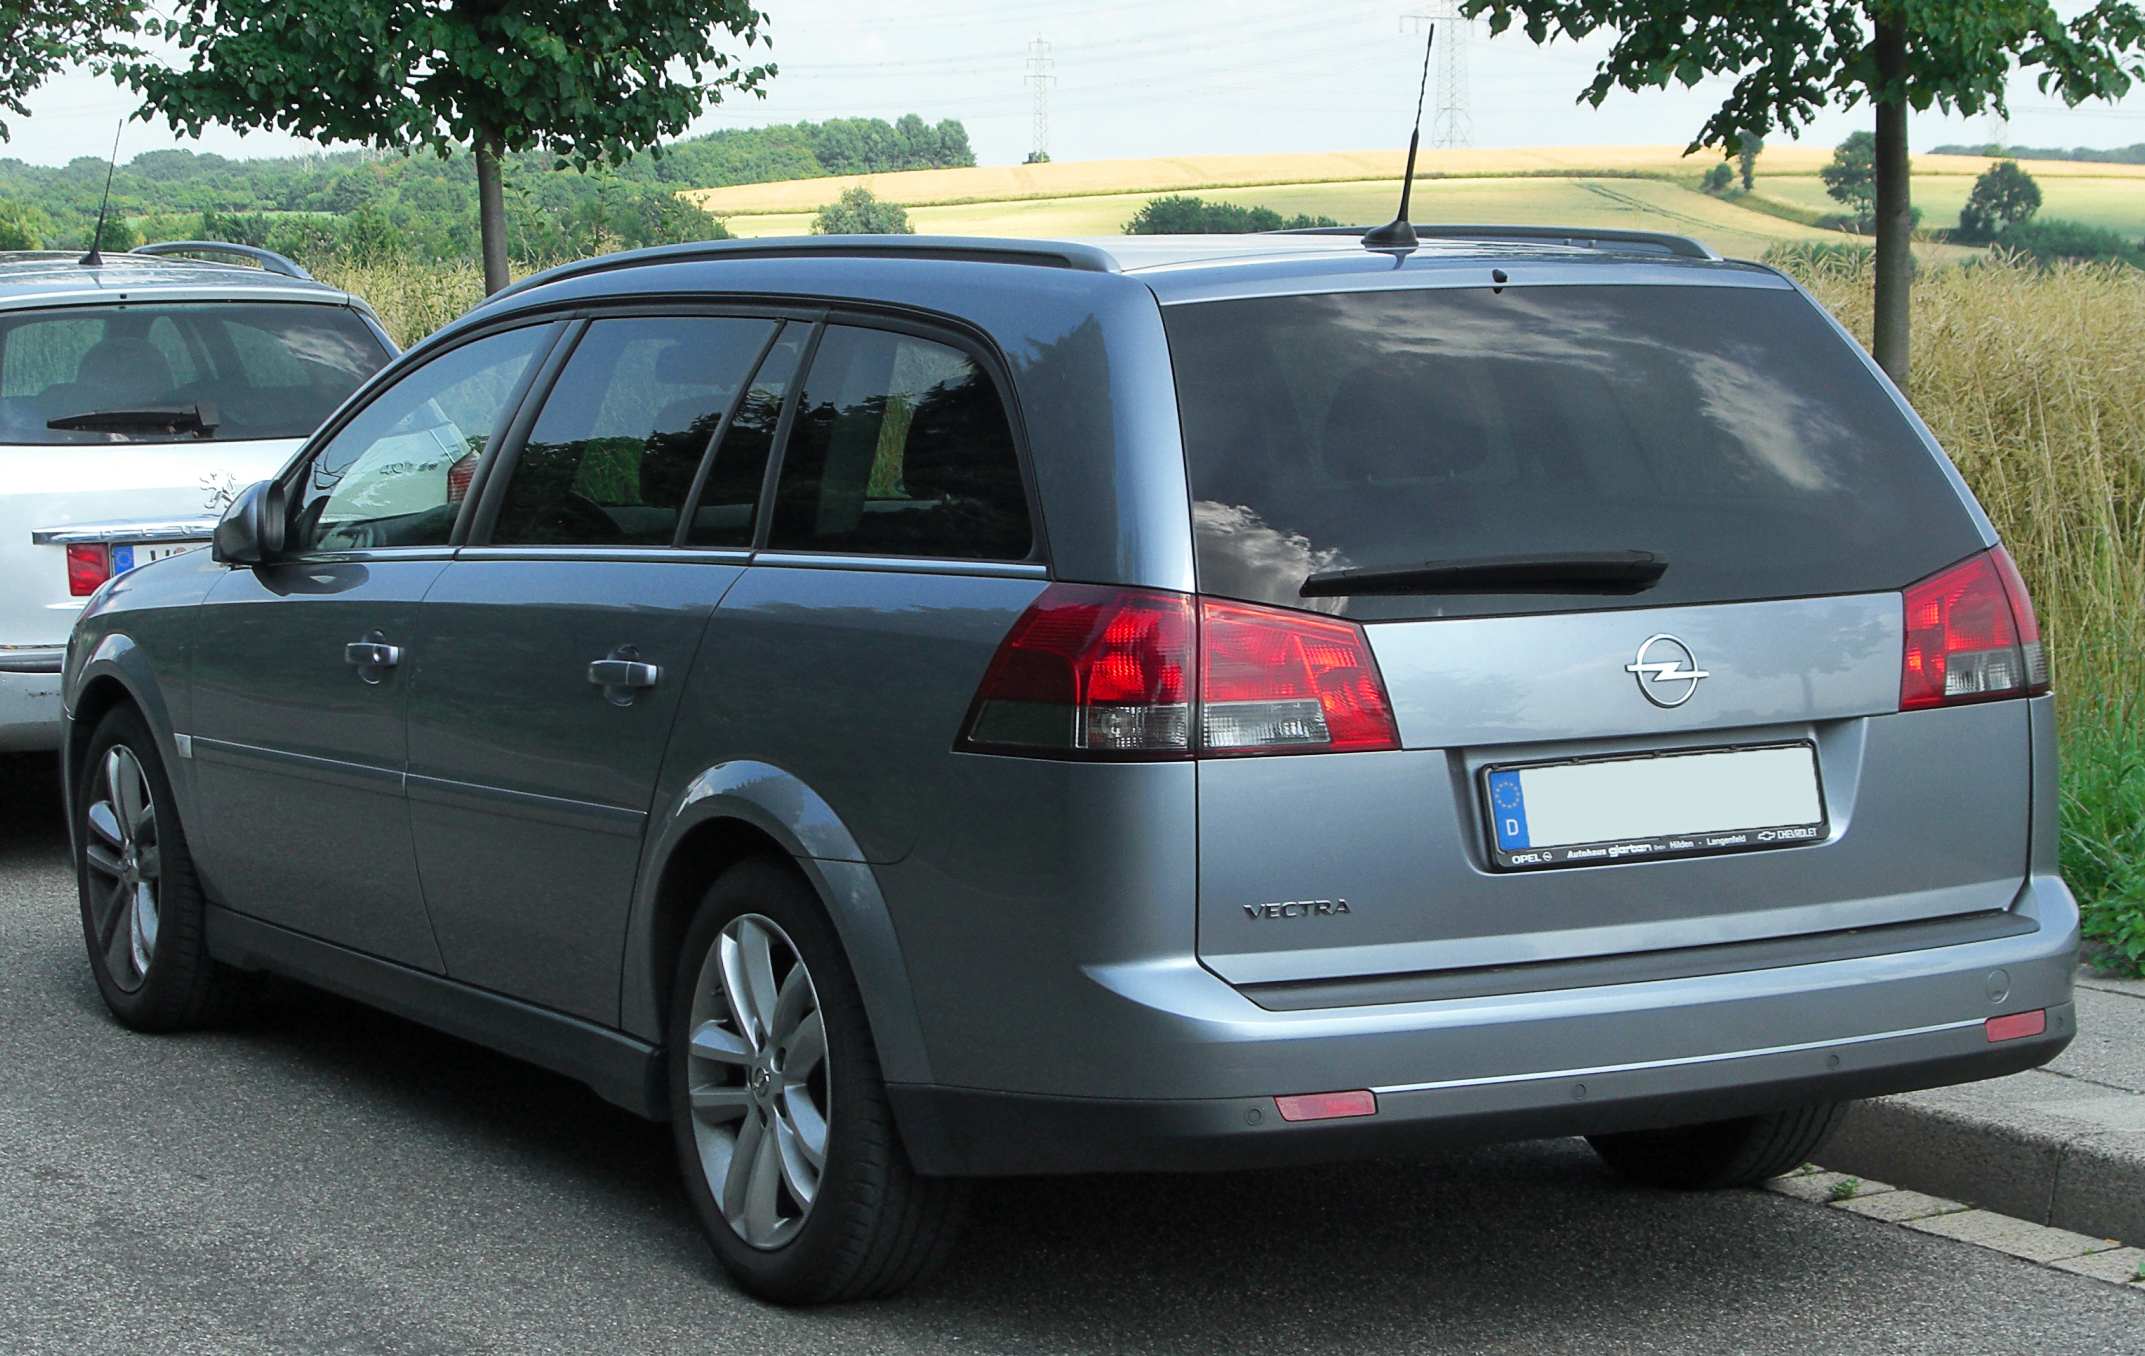 Opel Vectra OPC C Restyling 2005 - 2008 Station wagon 5 door #2